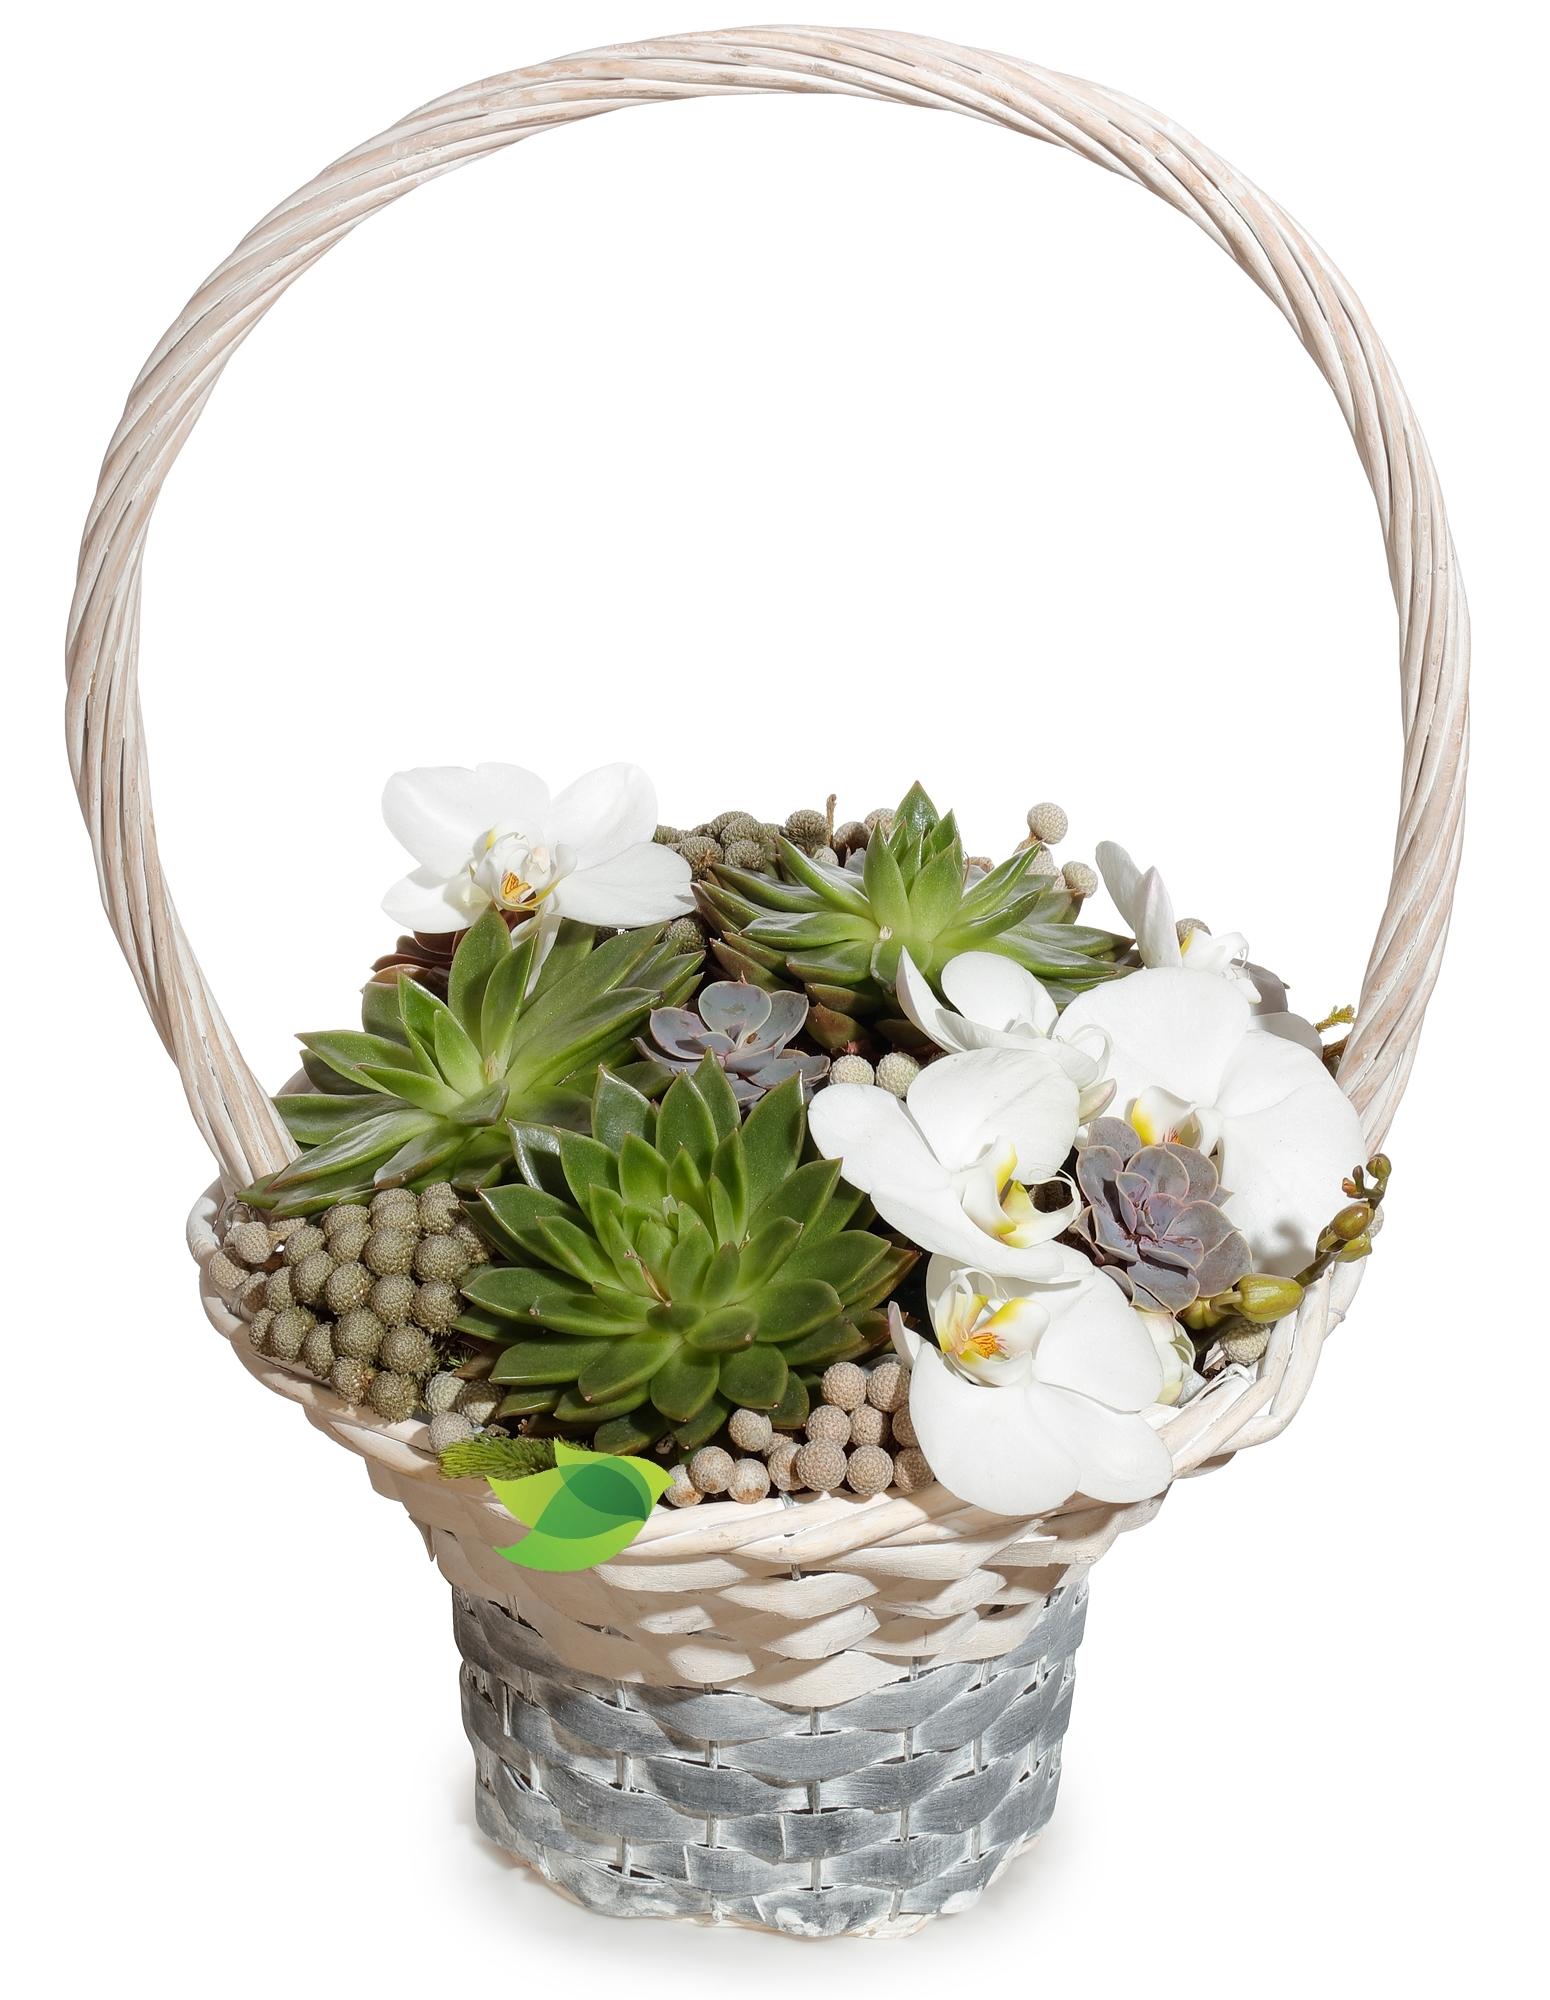 Фото букета: Корзина с суккулентами и орхидеей